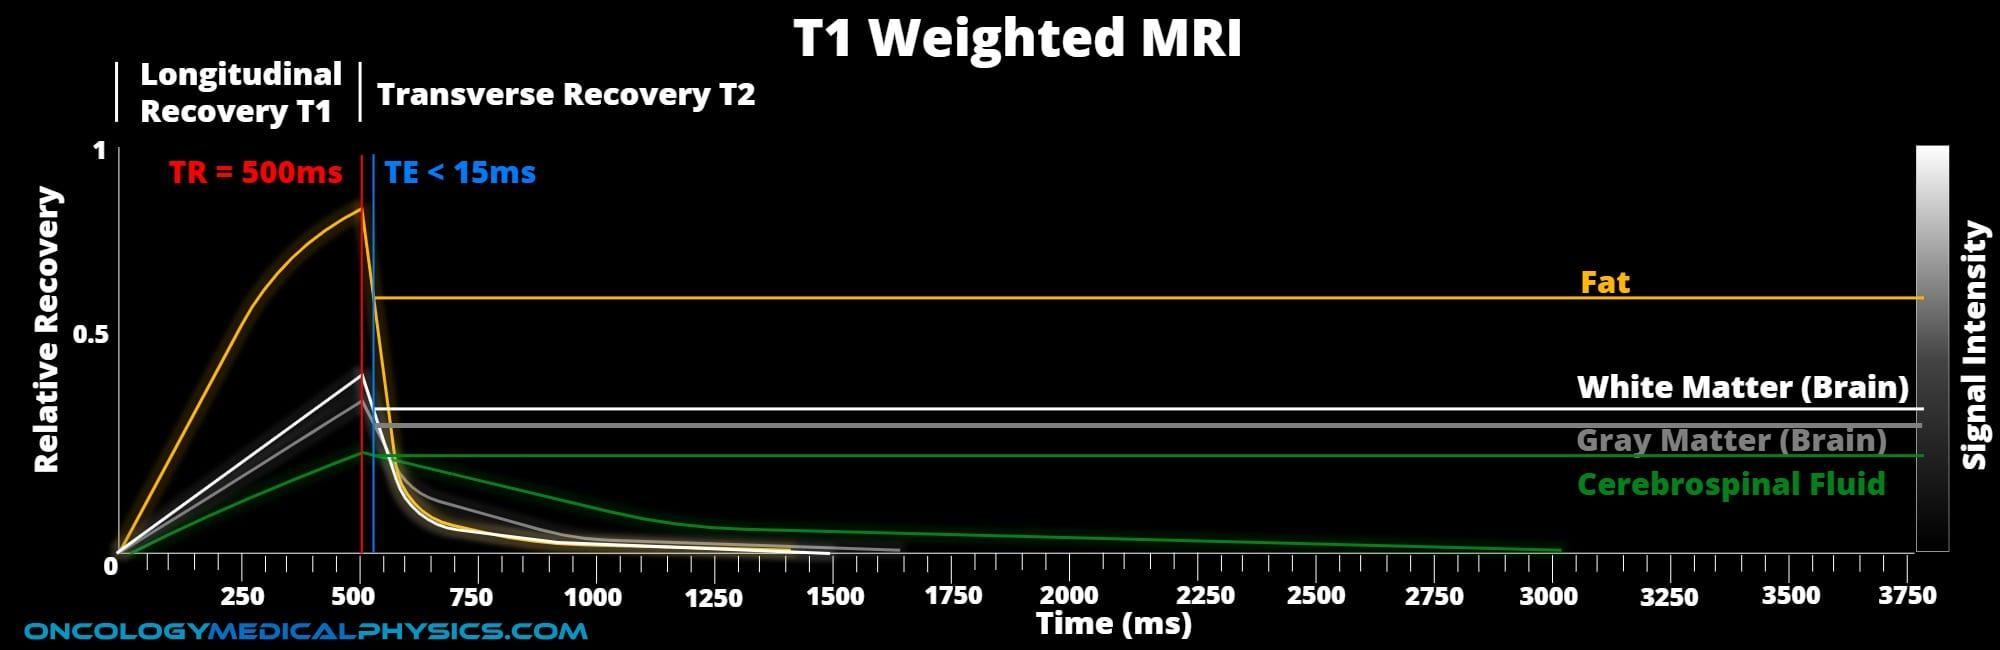 T1 weighting TE and TR MRI diagram